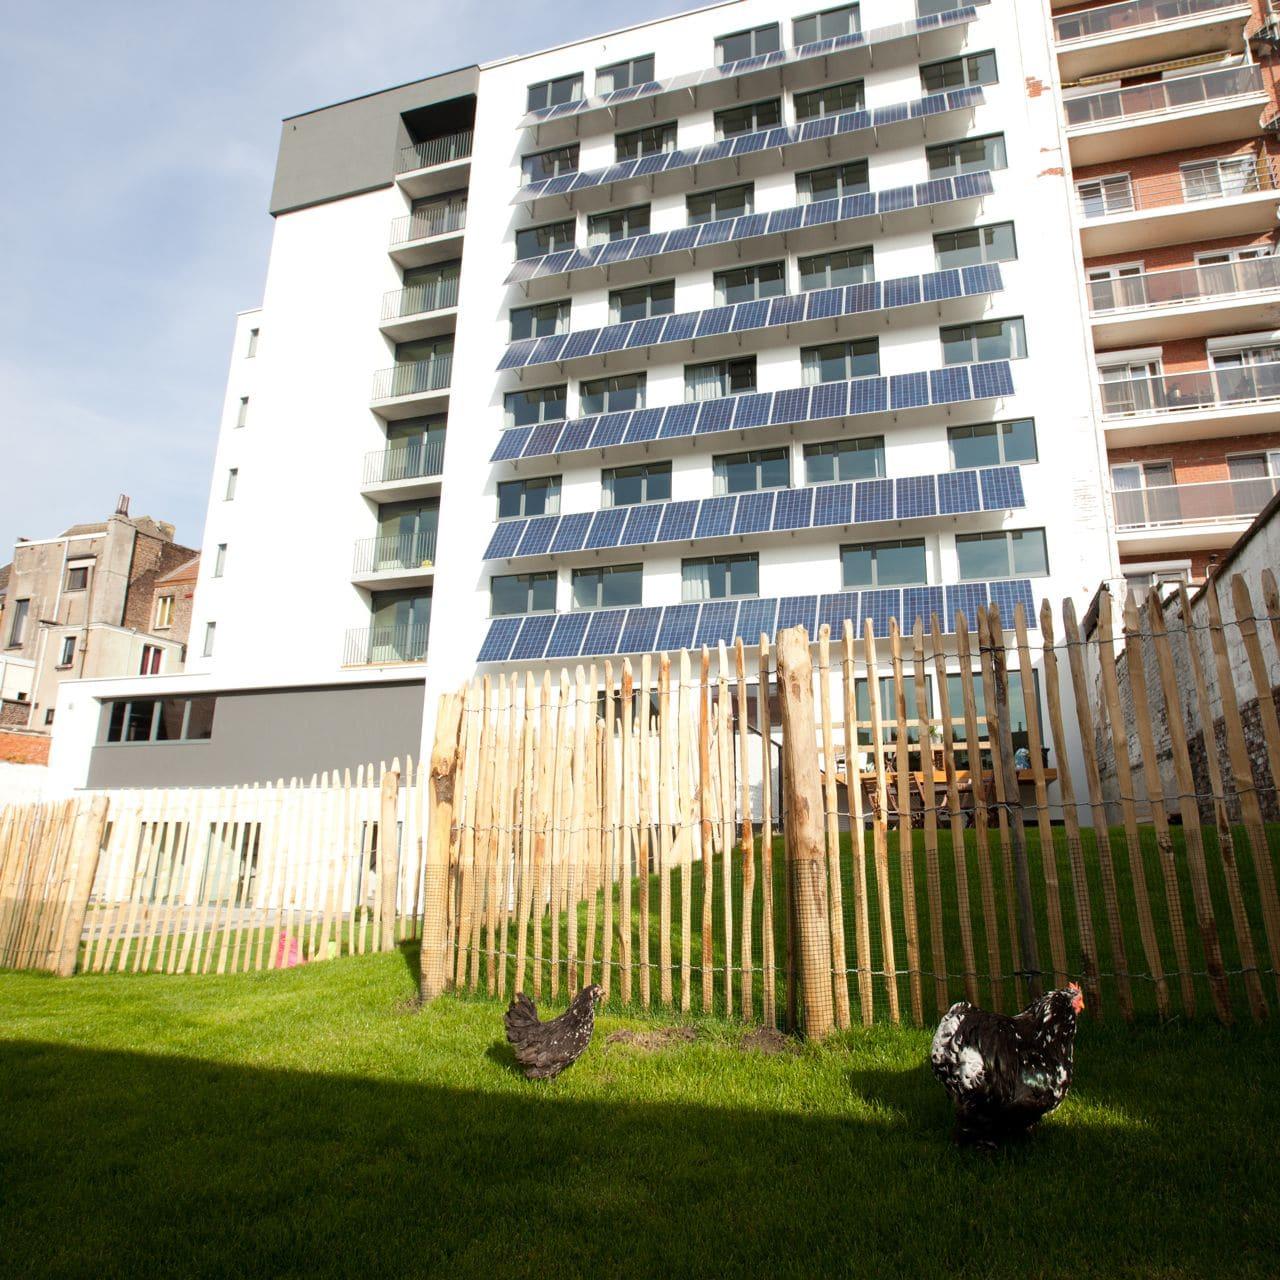 Upgrade Ter Plaeten021 | Baeyens & Beck architecten Gent | architect nieuwbouw renovatie interieur | high end | architectenbureau